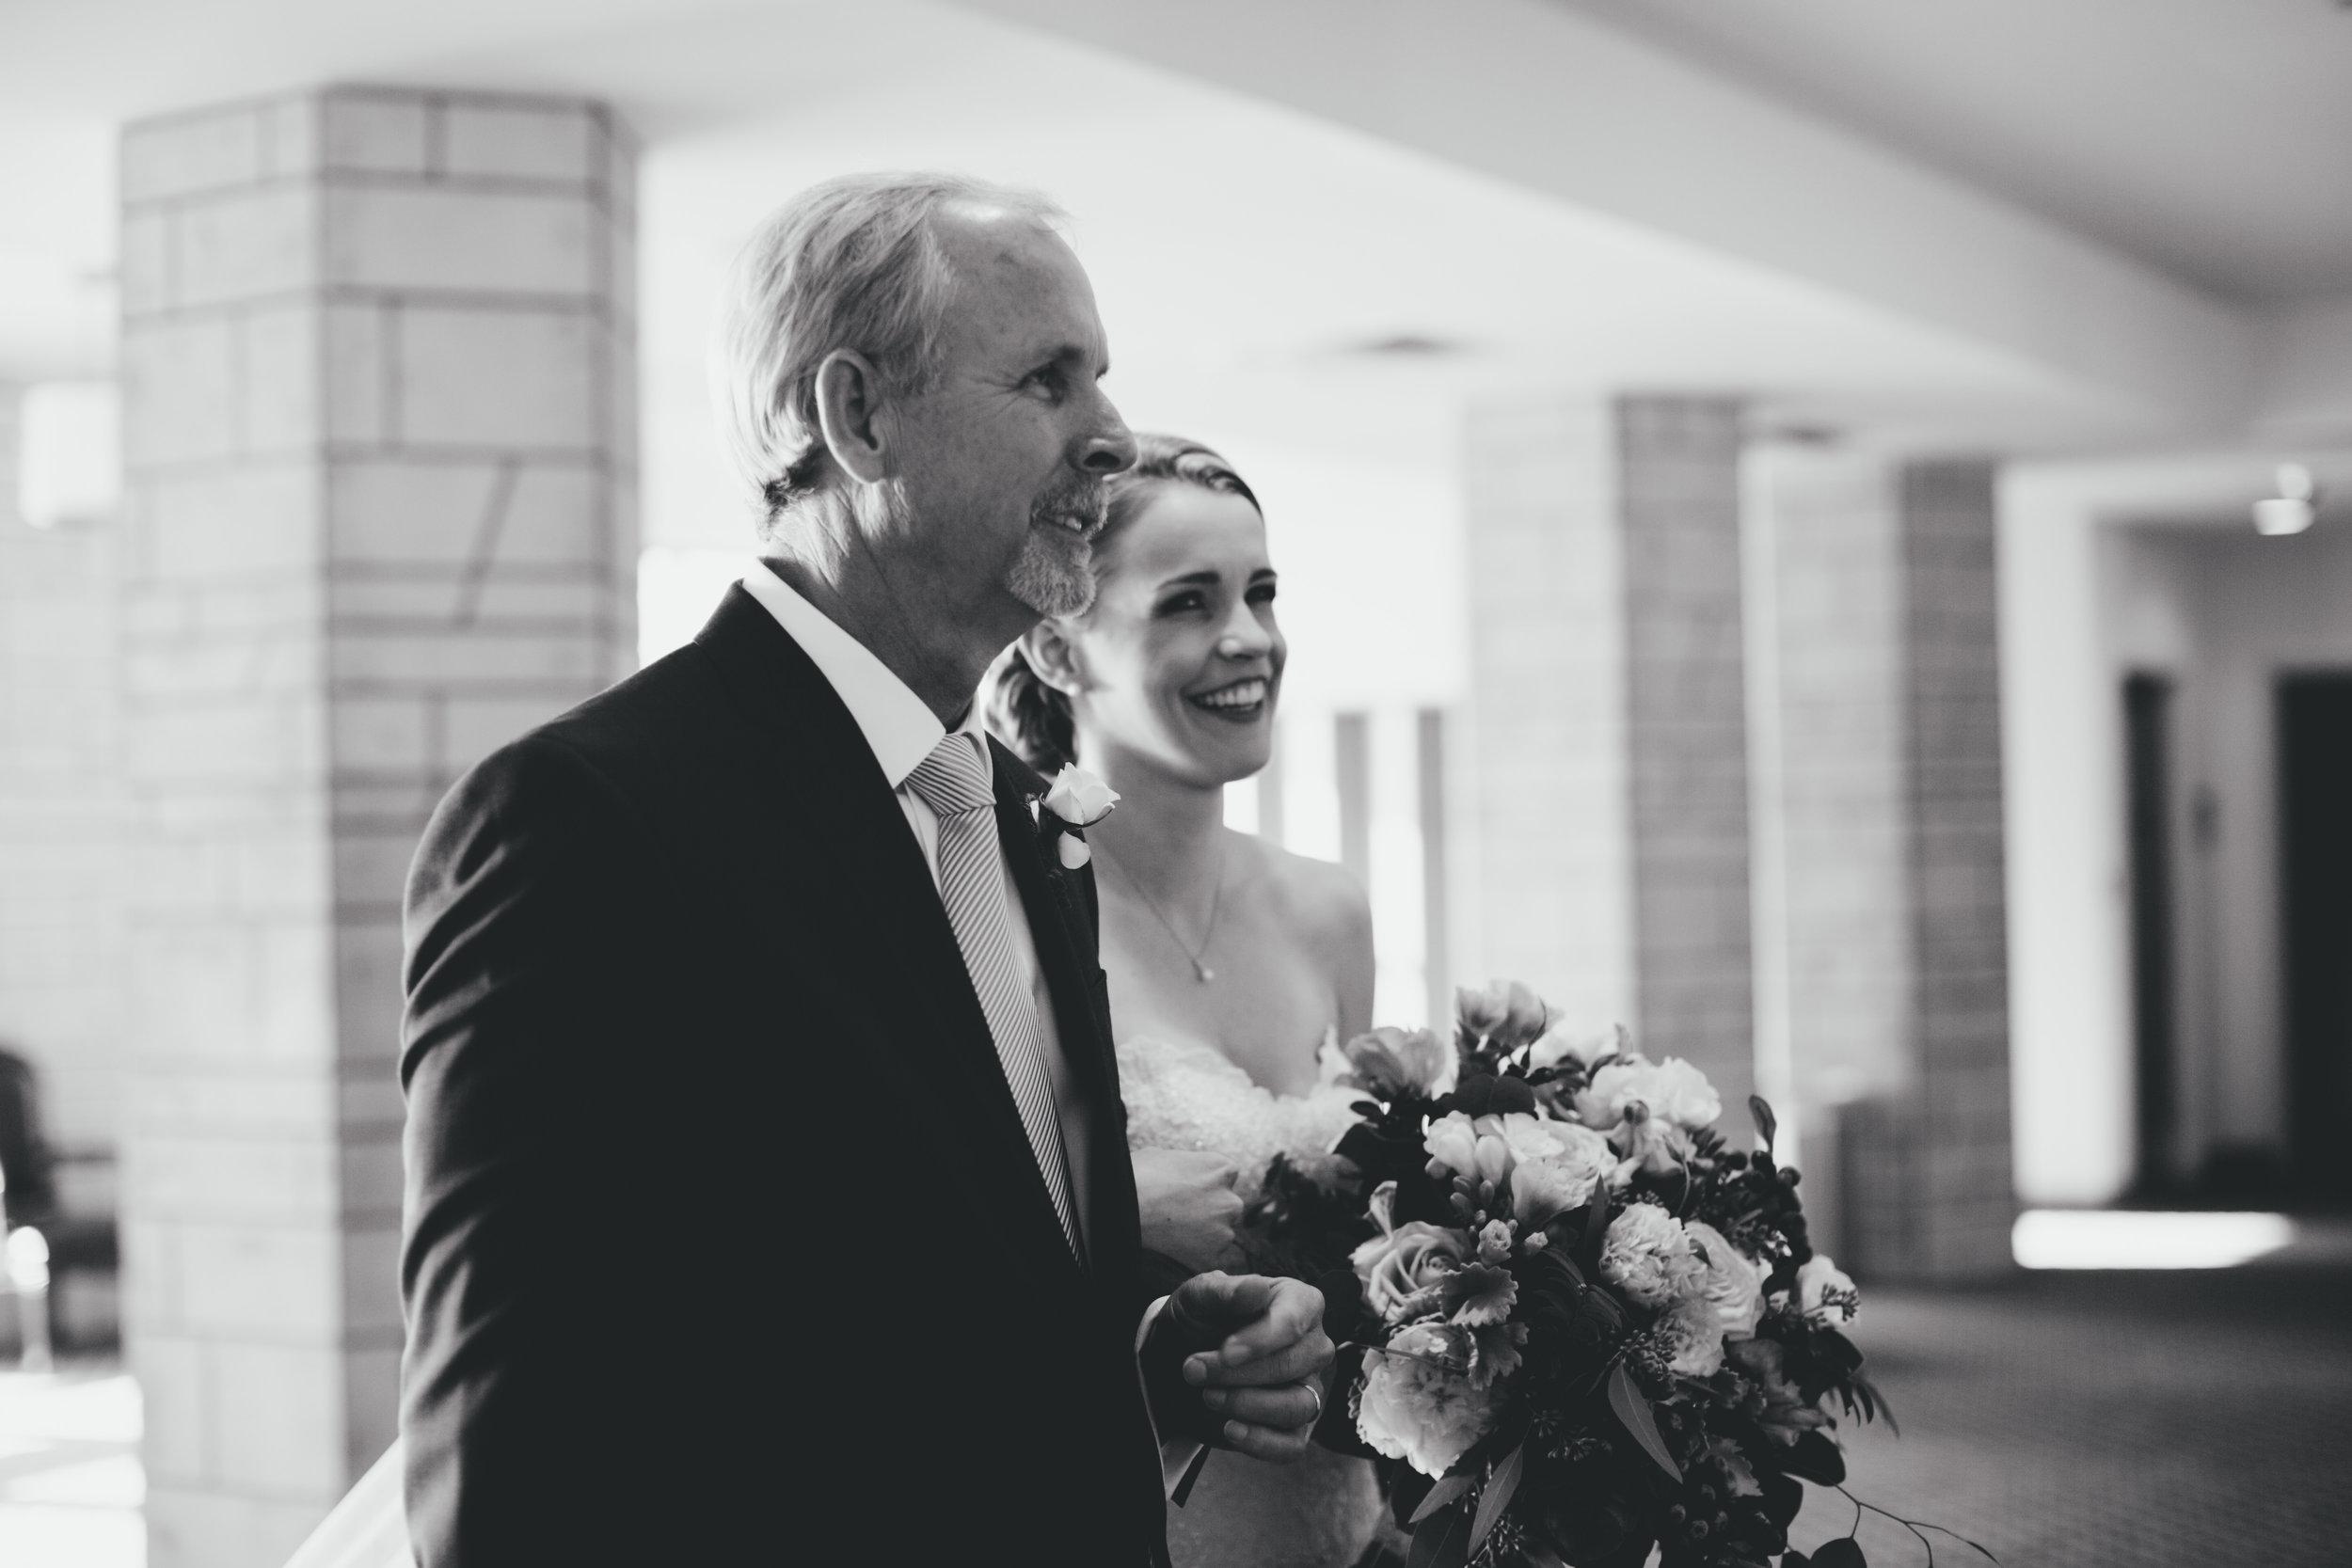 downtown lakeland wedding jake and katie photography-6.jpg